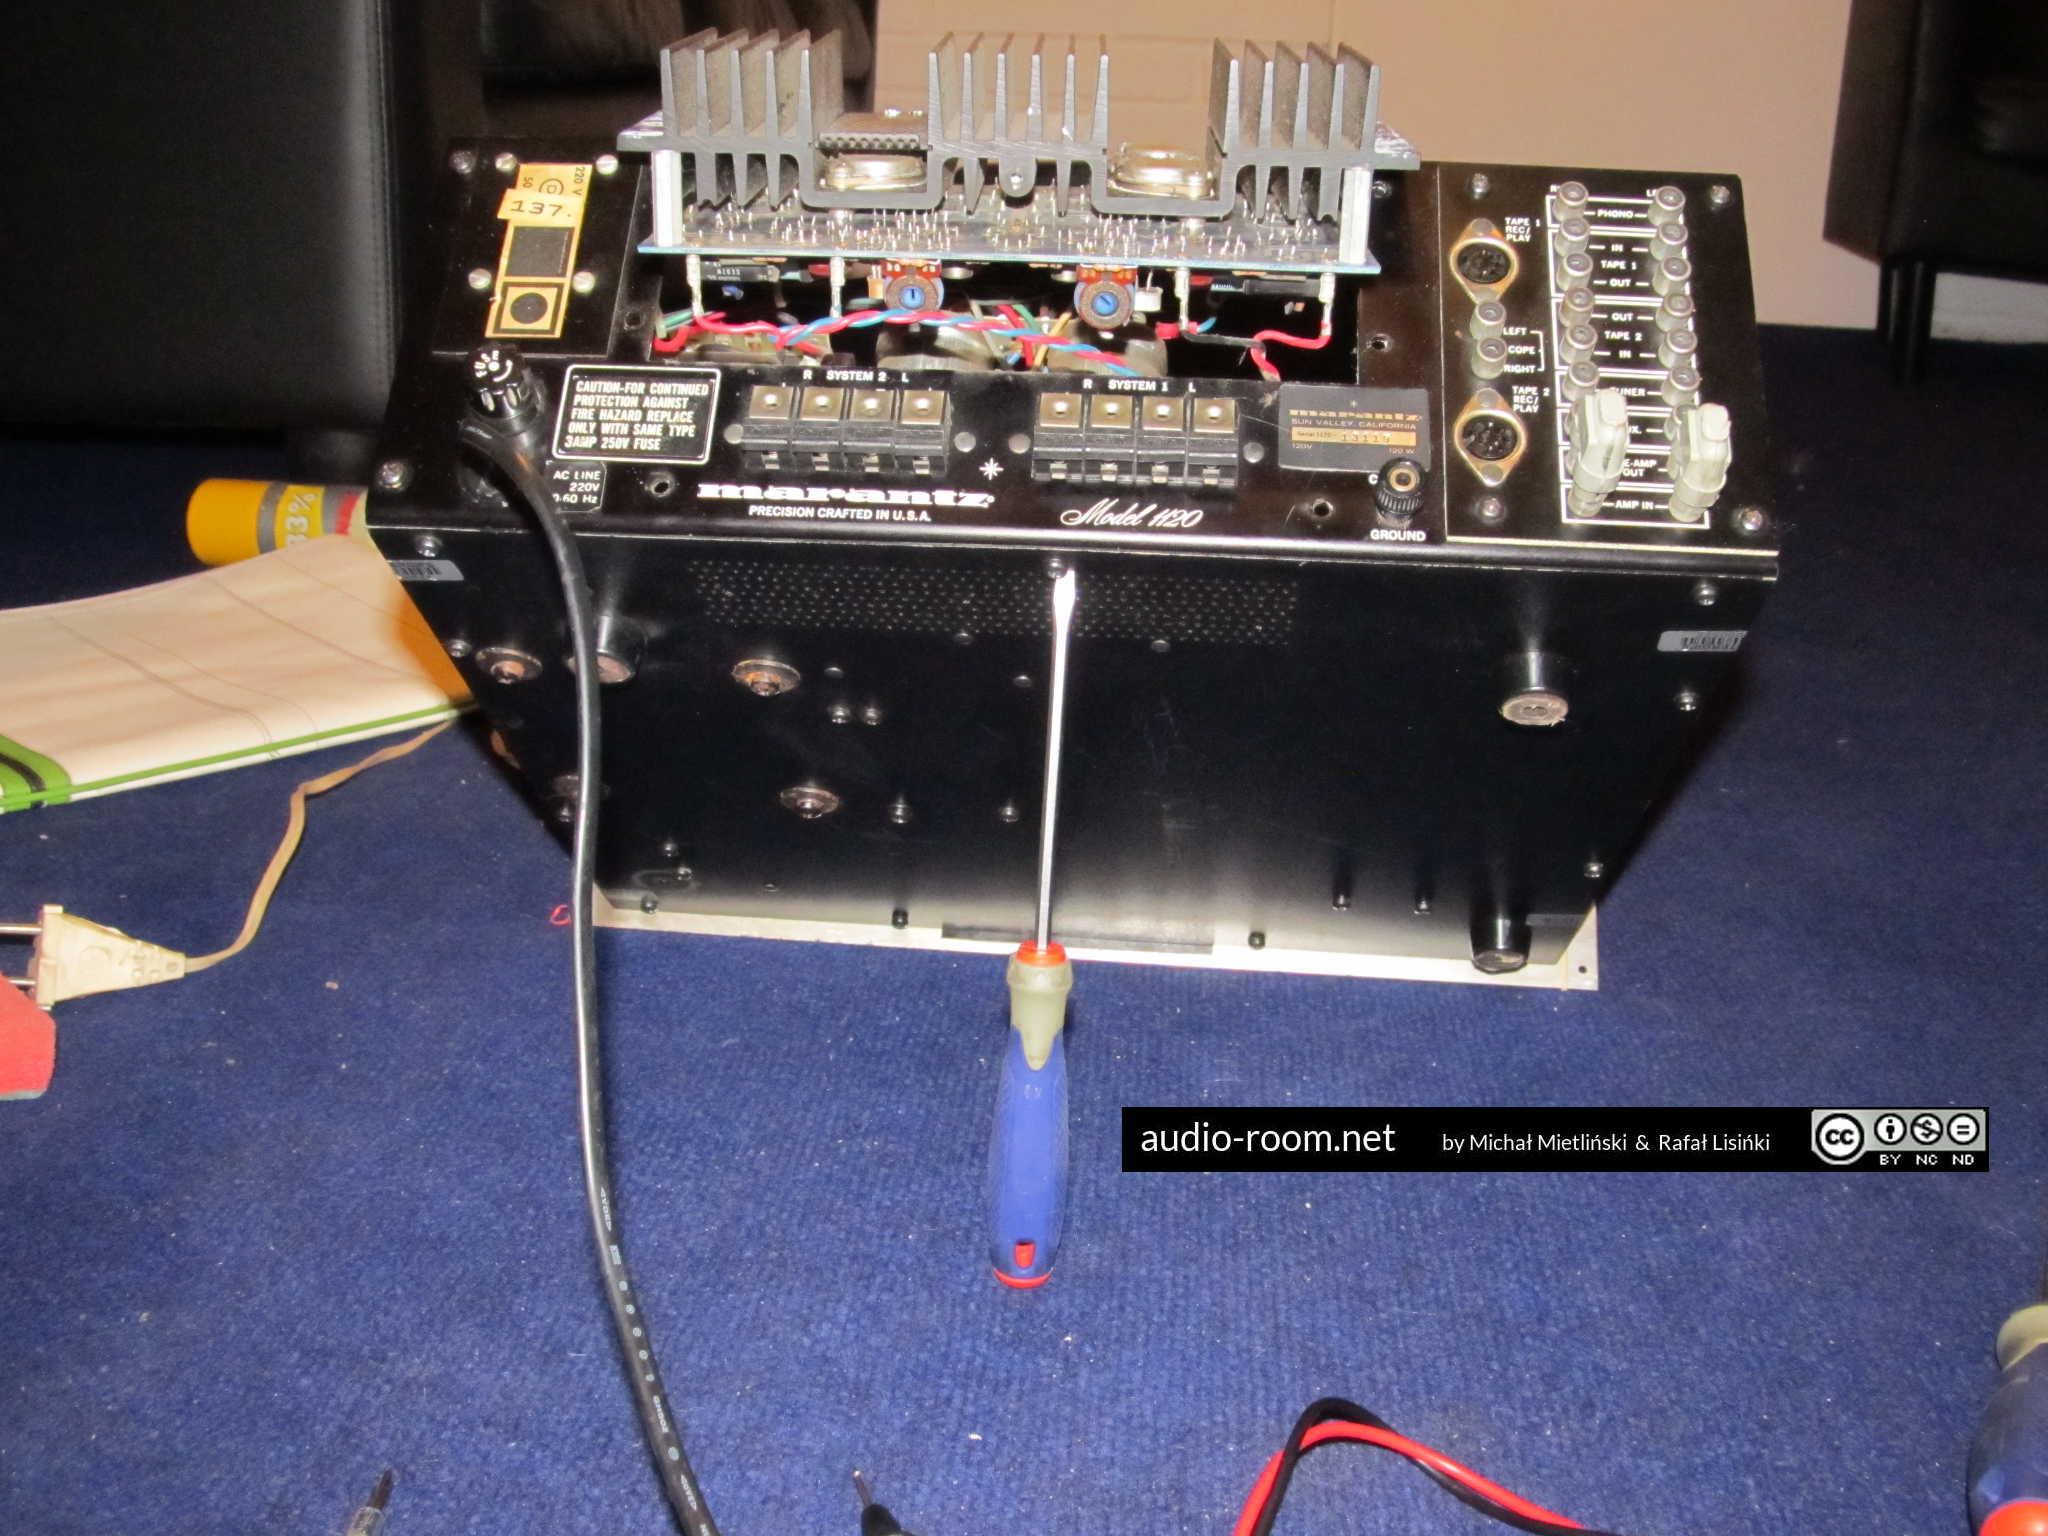 ... Array - marantz rc5400 manual ebook rh marantz rc5400 manual ebook  topmalawis de